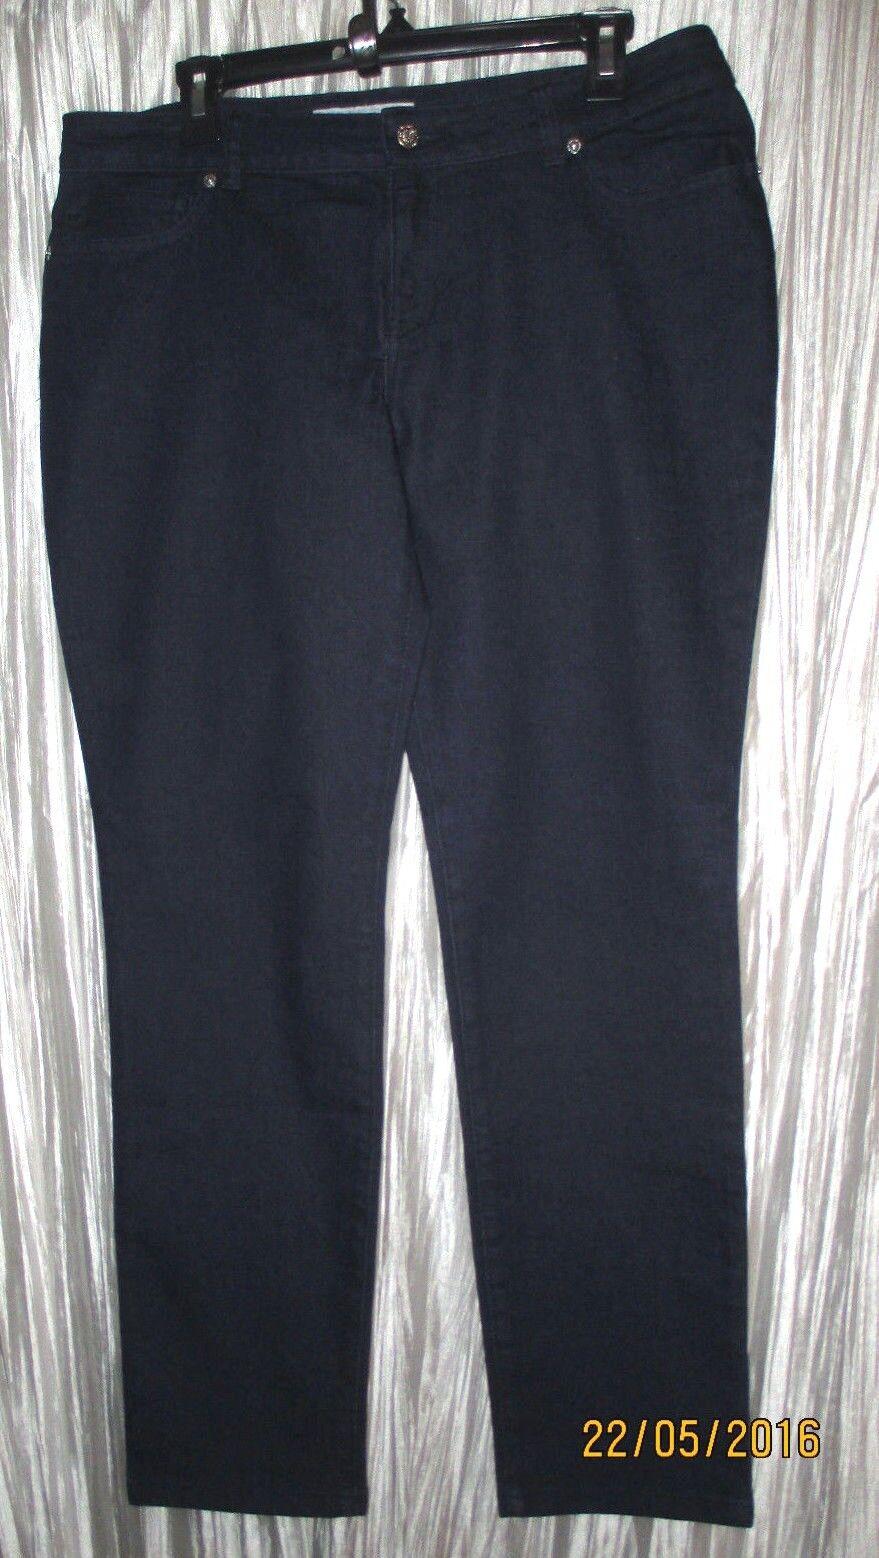 New KENNETH COLE REACTION Cotton Poly Spandex, Dark Denim,Skinny Jeans,14 R